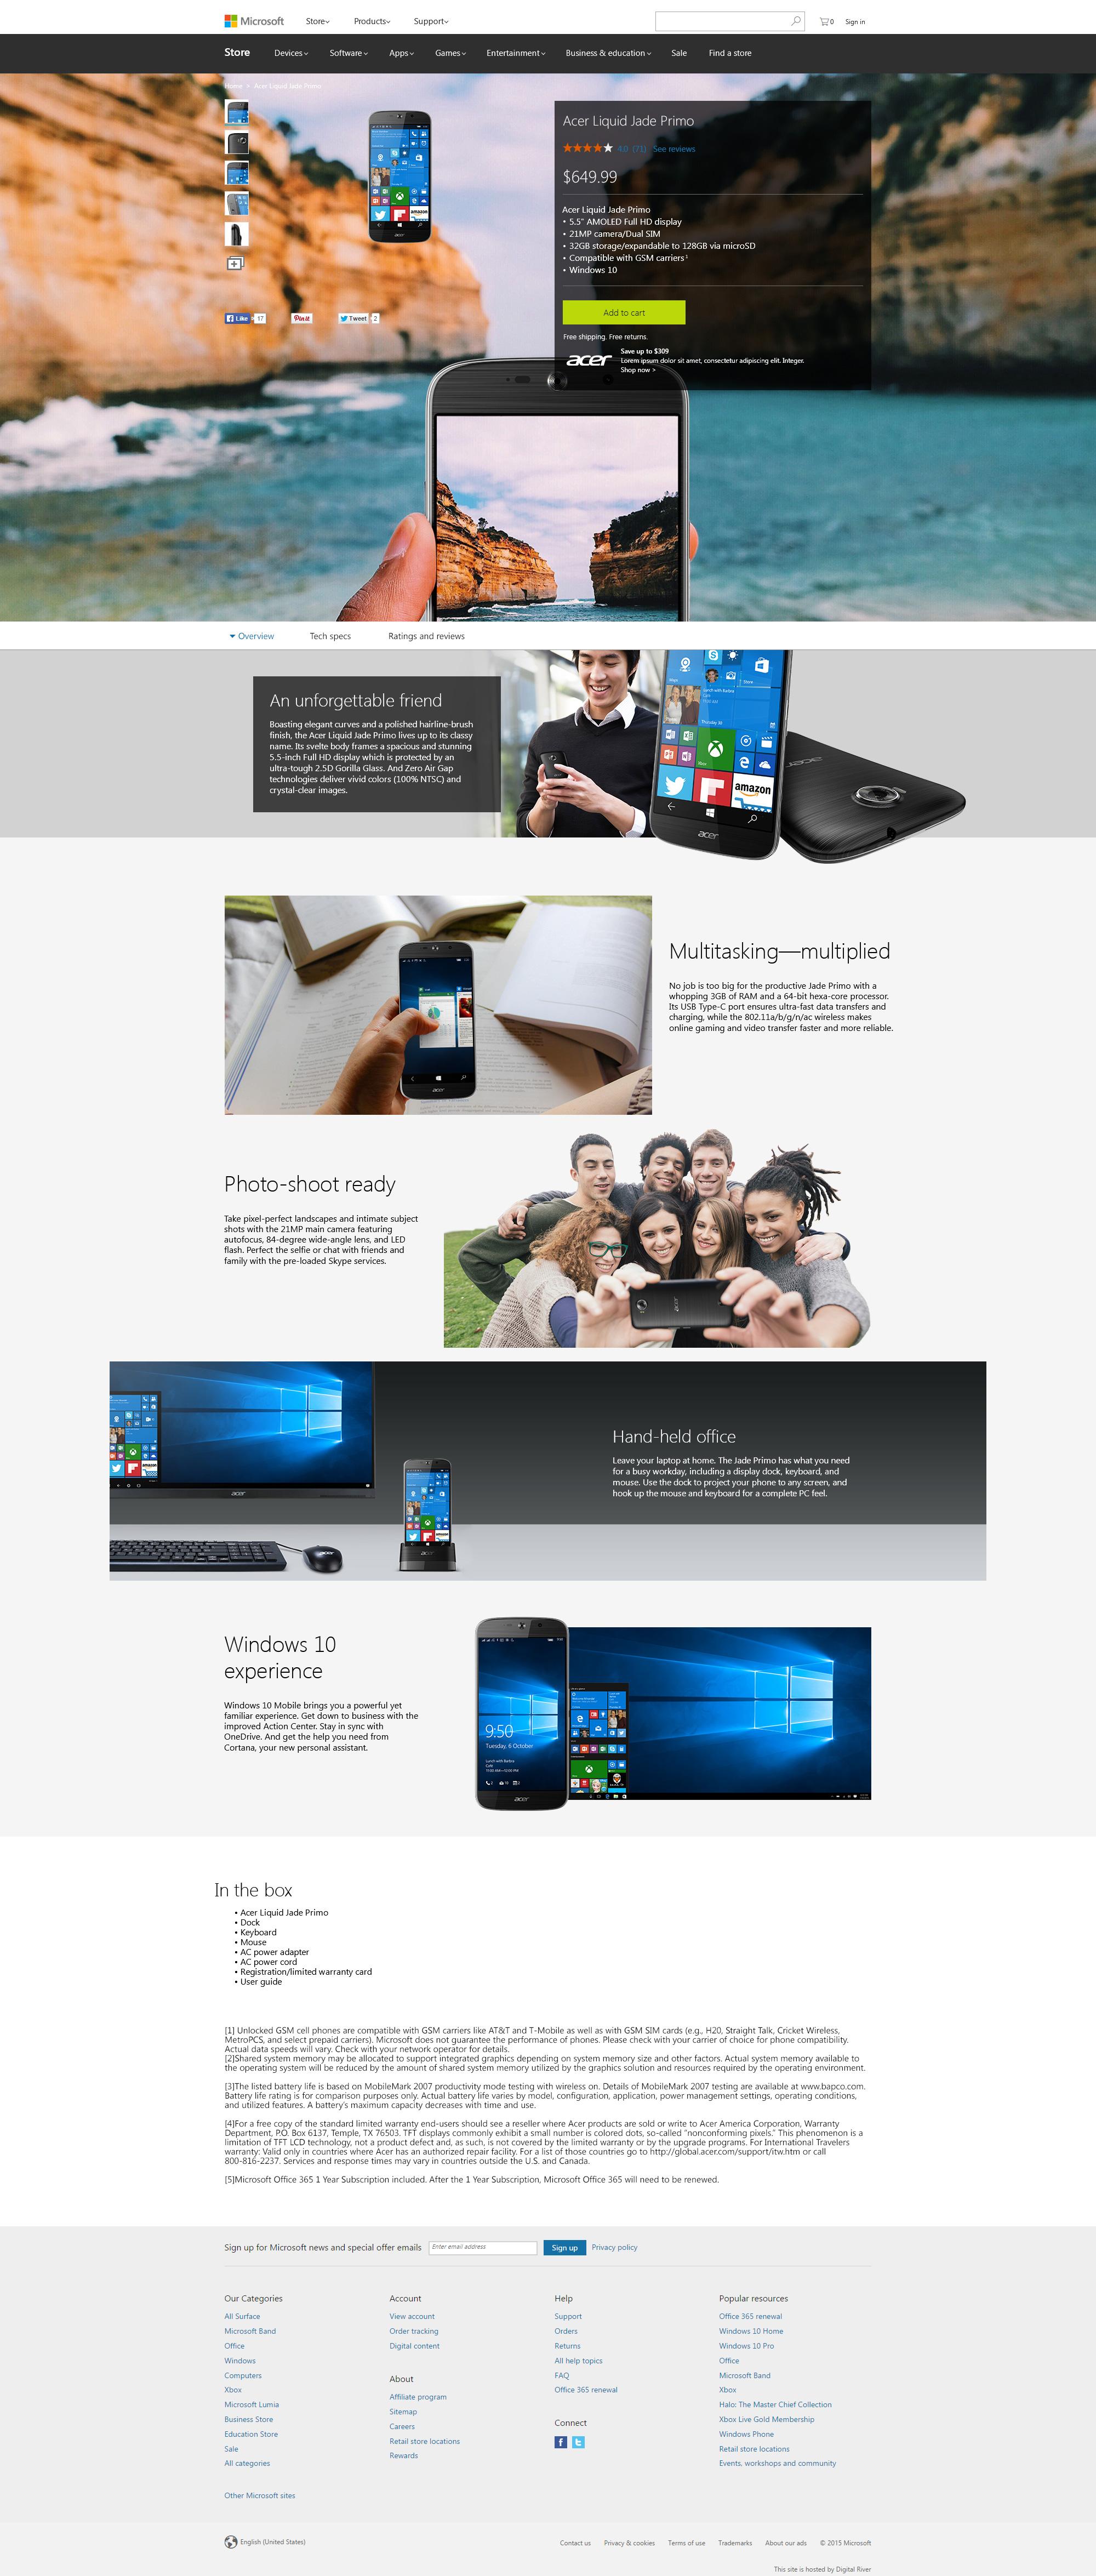 en-INTL-PDP-Acer-Liquid-Jade-Primo-QJ4-00009-comp-with-background.jpg